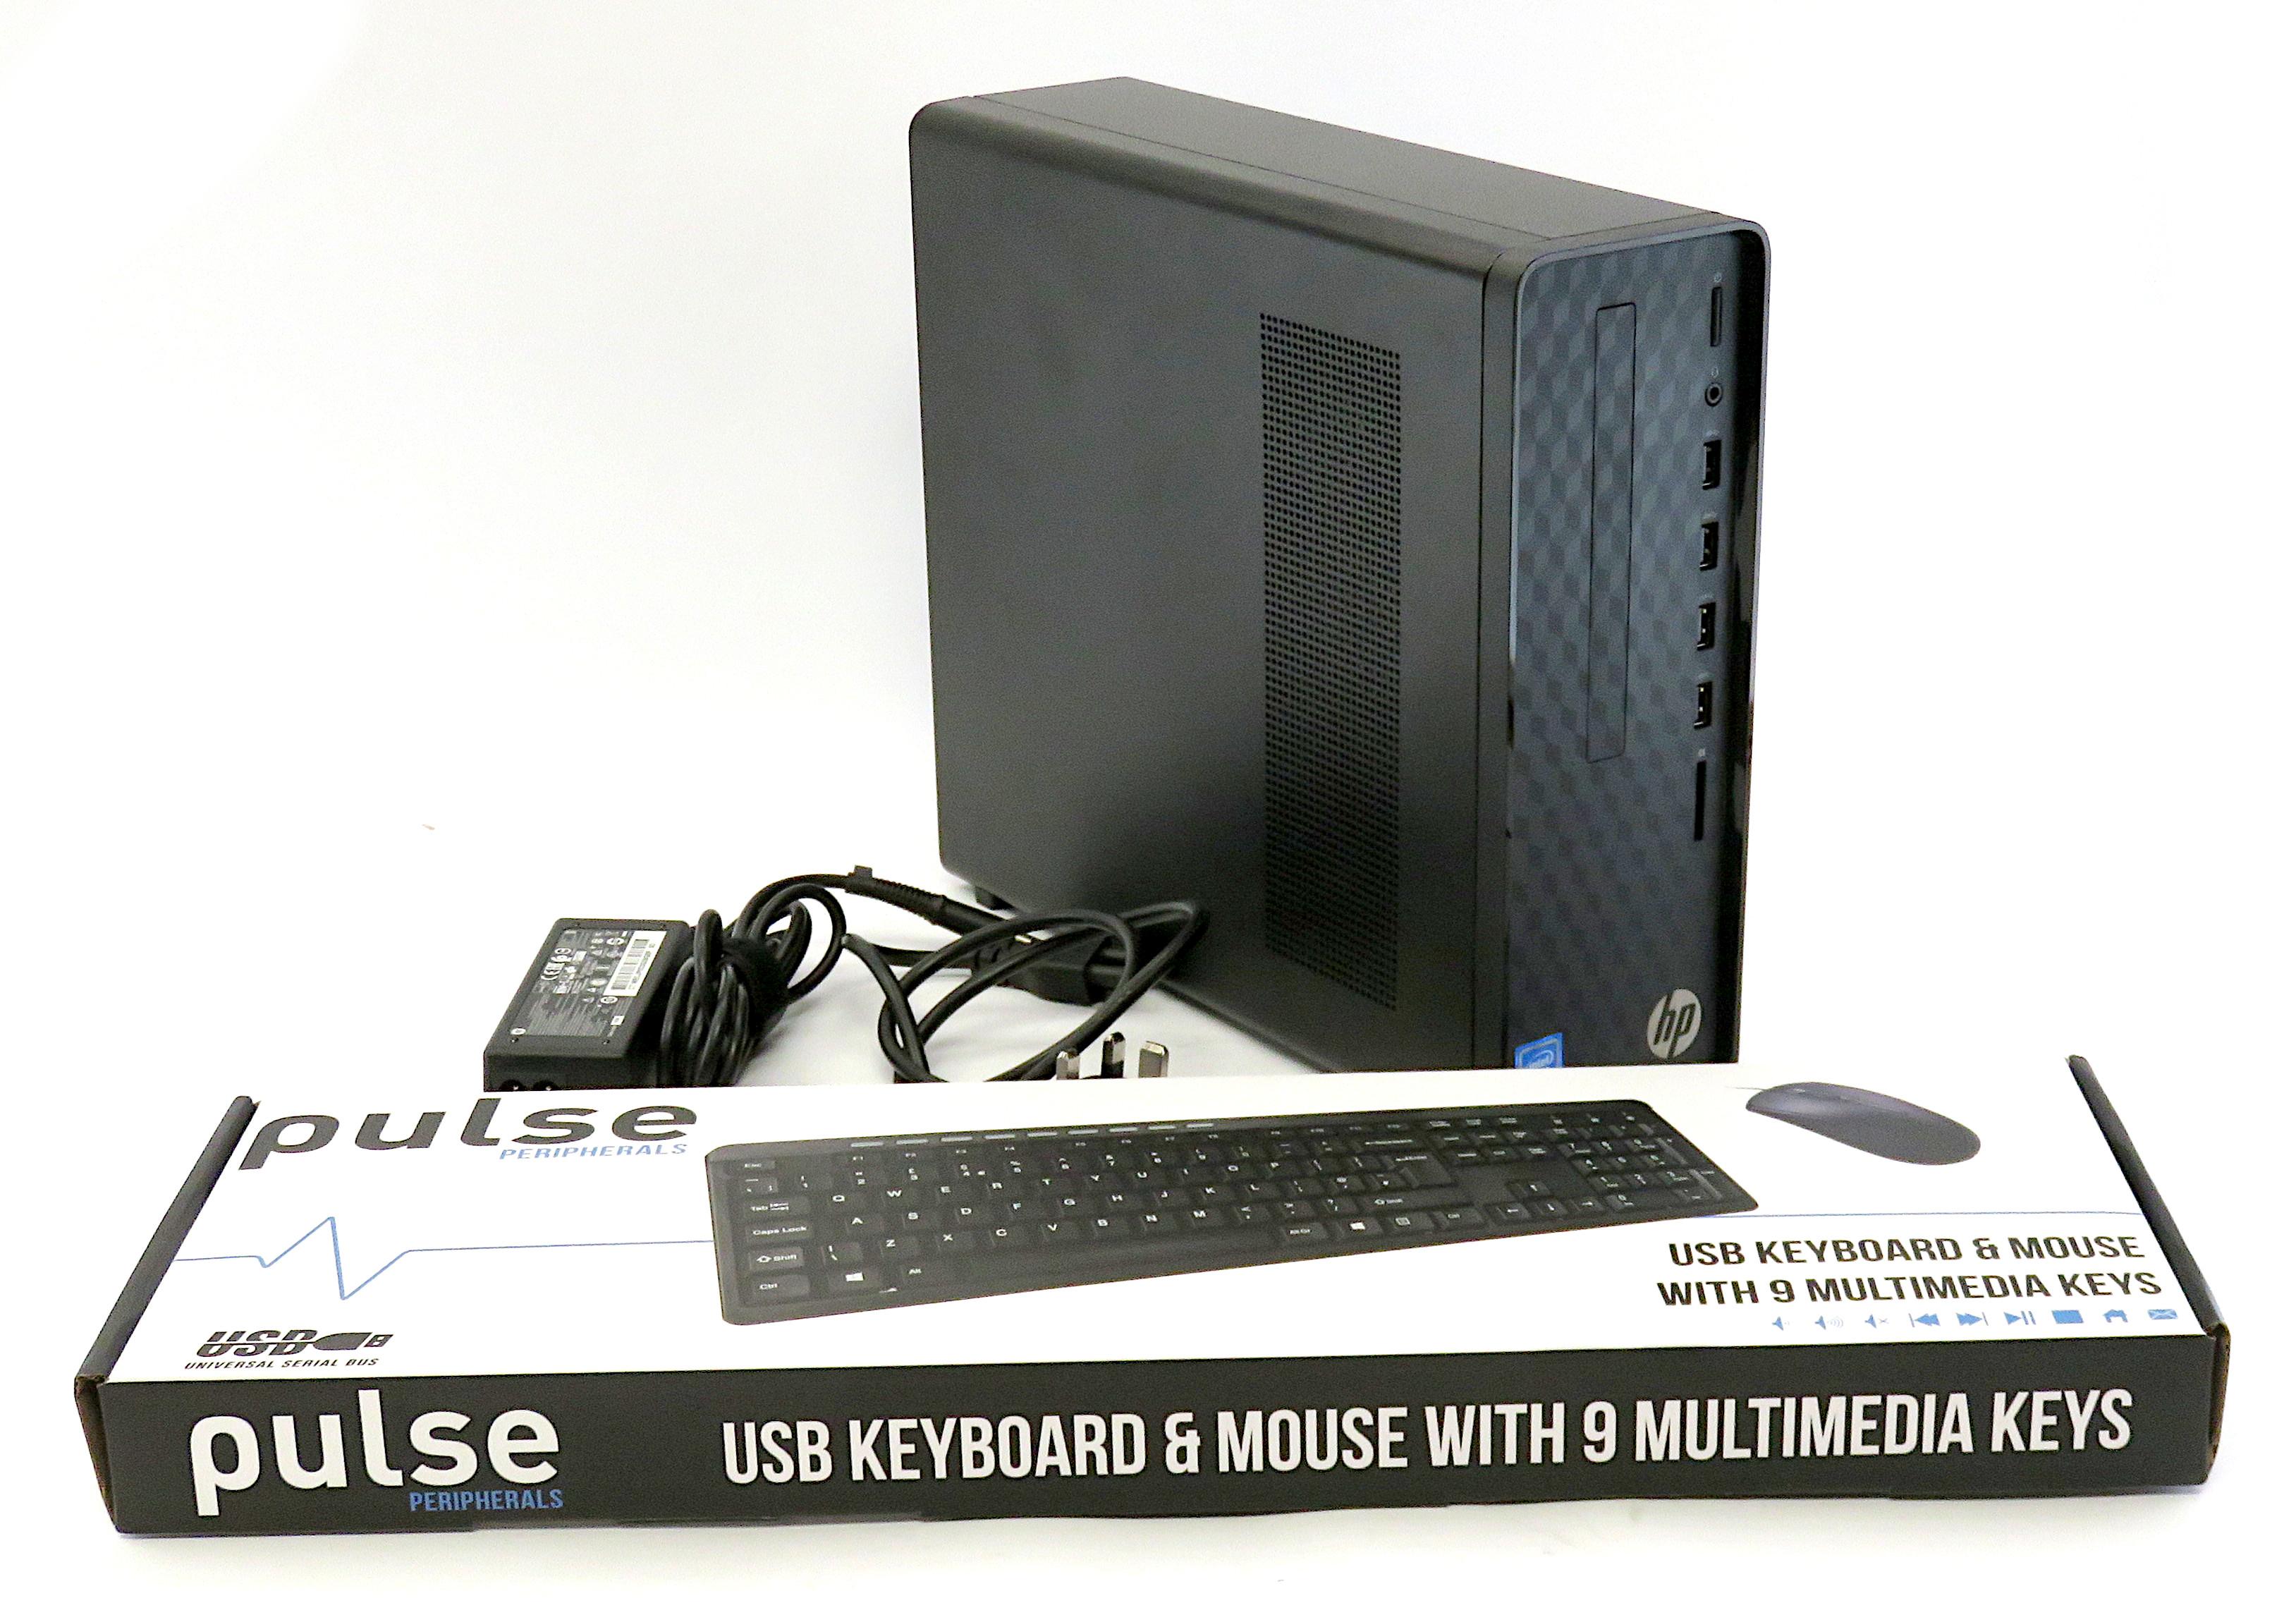 HP Desktop PC S01-af1005na: Celeron J4025 8GB RAM 128GB SSD 1TB HDD Win 10 Home